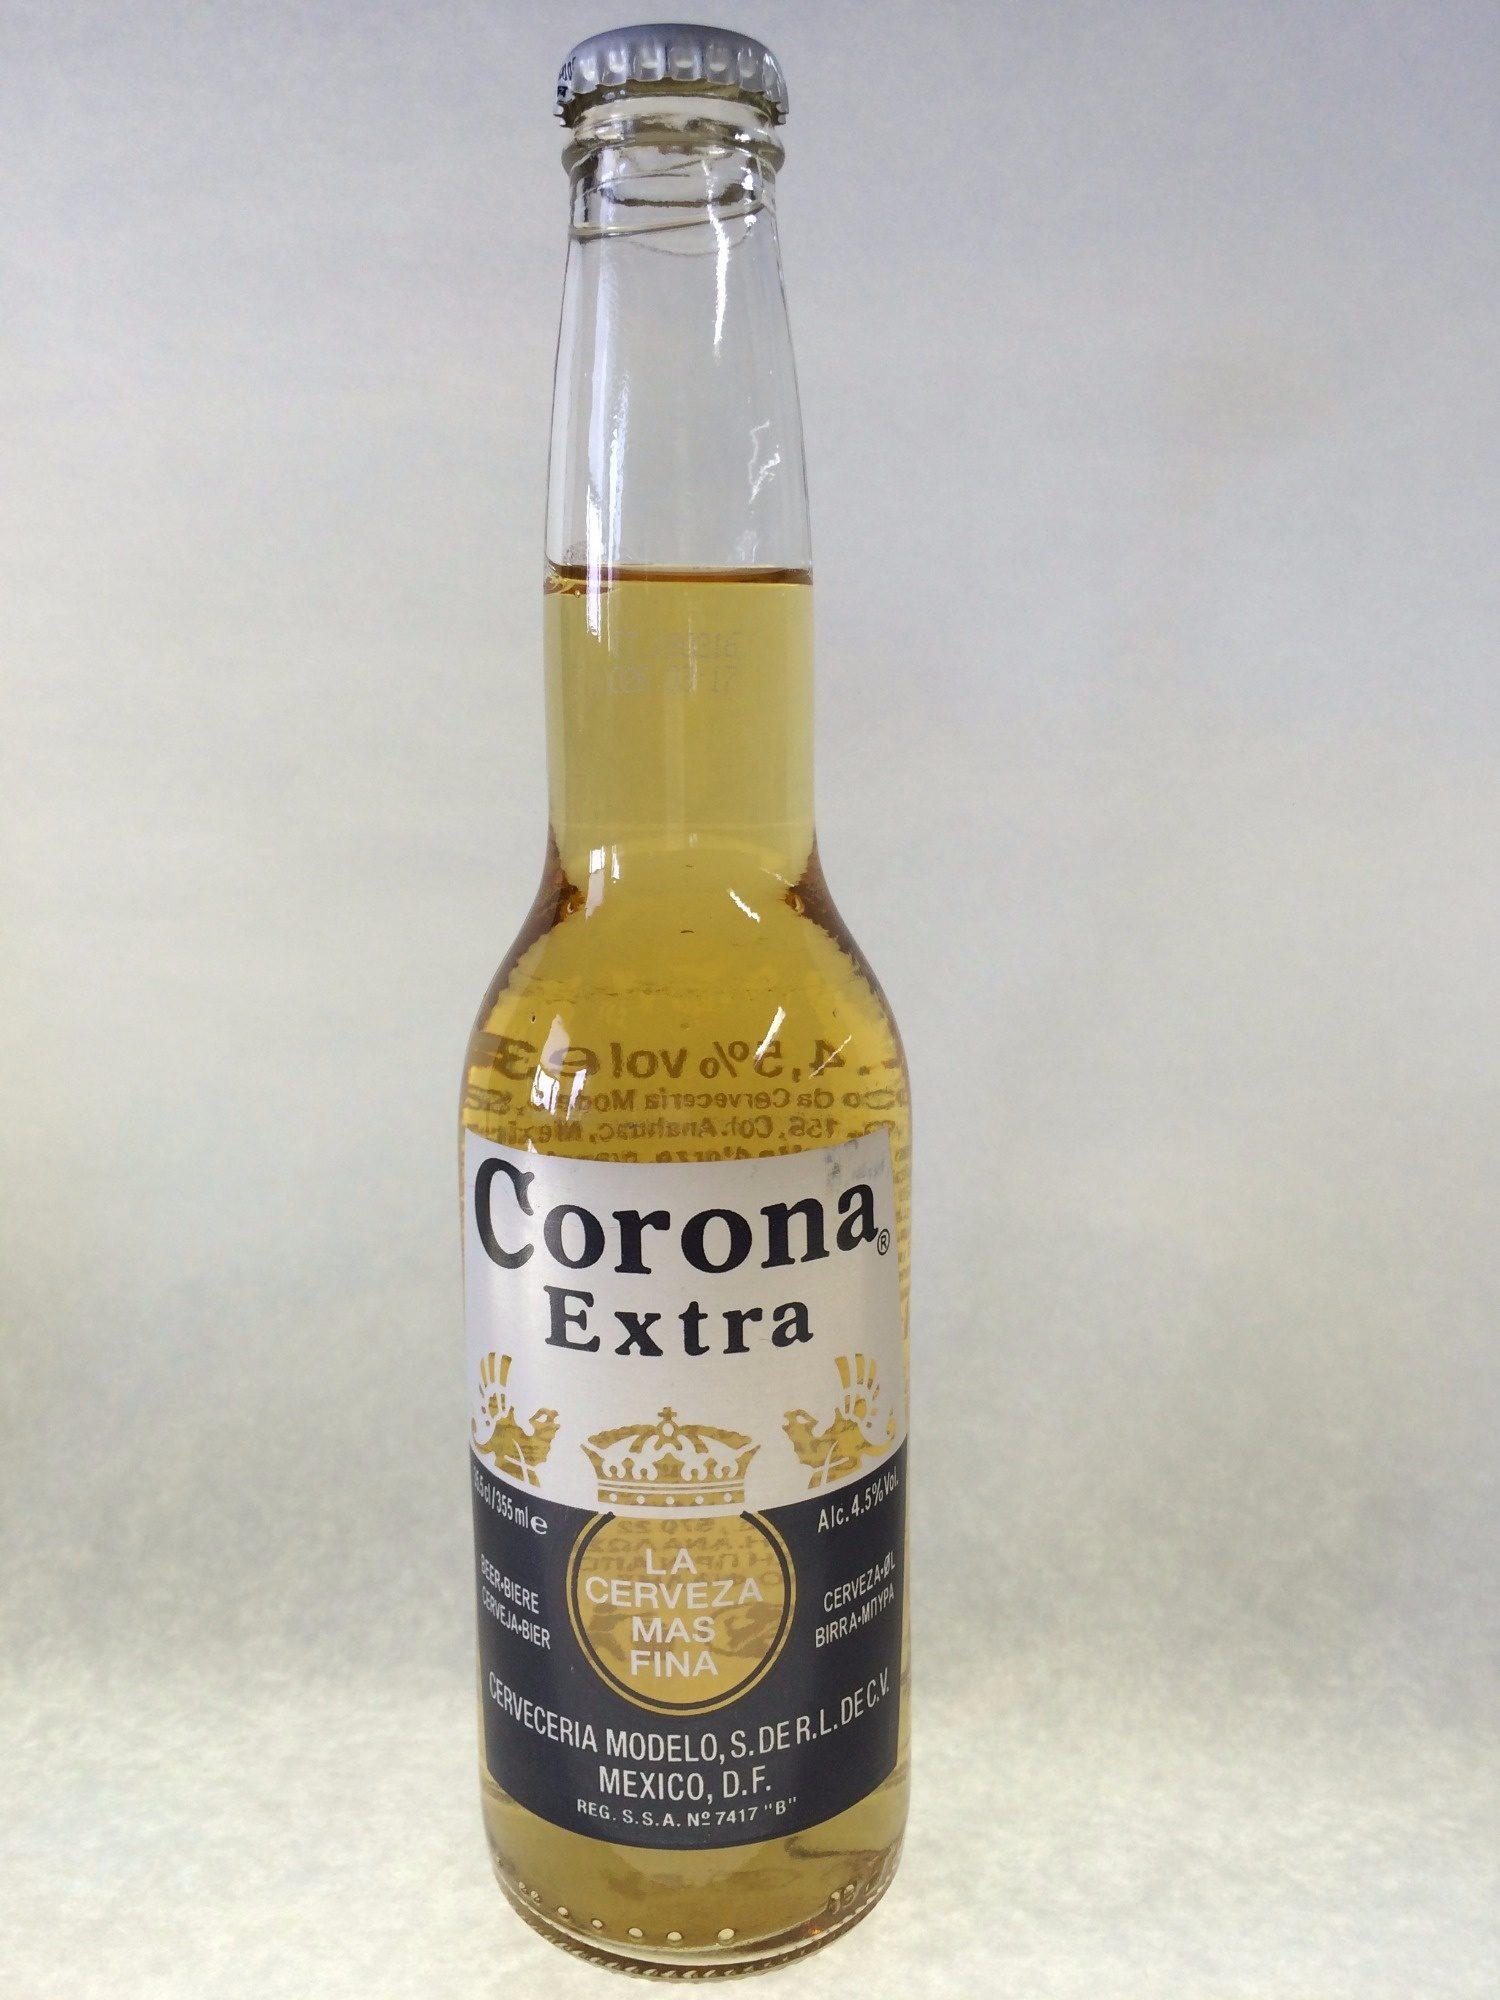 Corona,AB-Inbev - Product - en